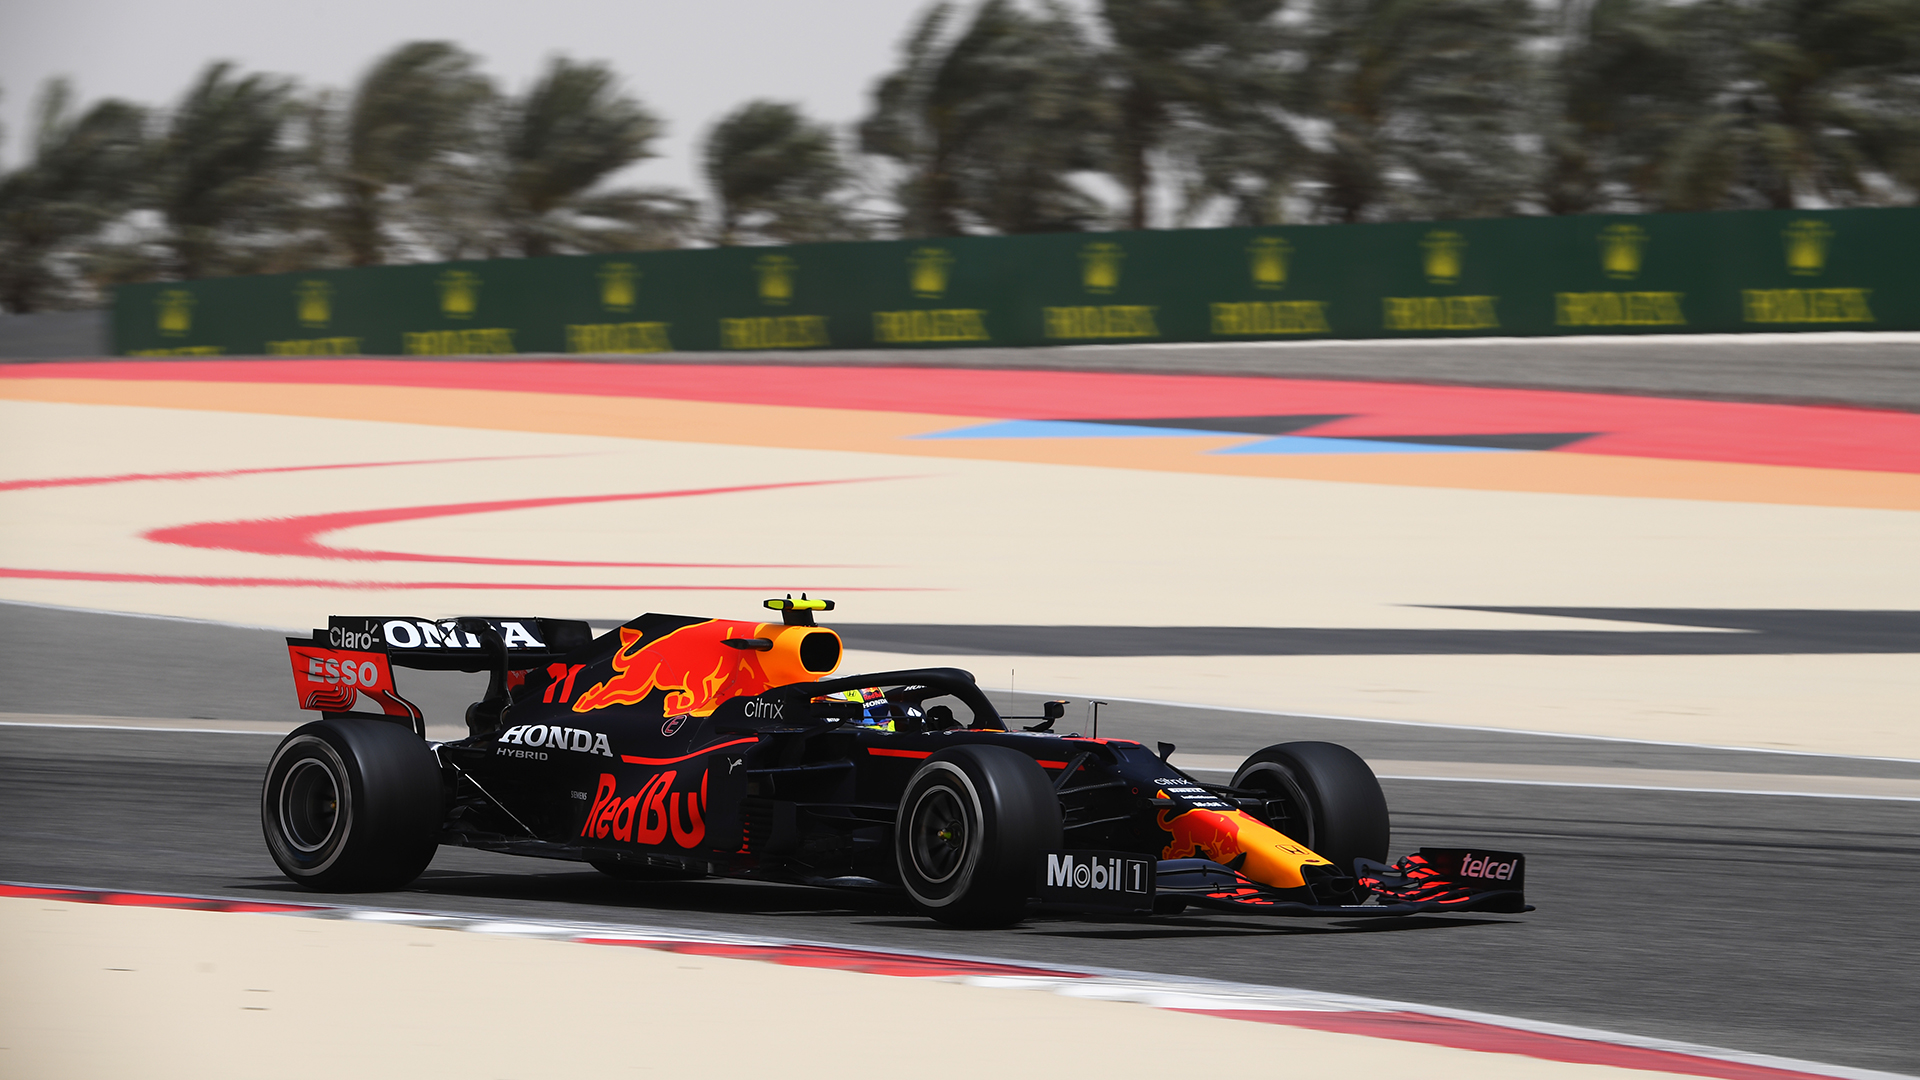 F1 Azerbaijan live stream — how to watch the Azerbaijan Grand Prix online – Red Bull